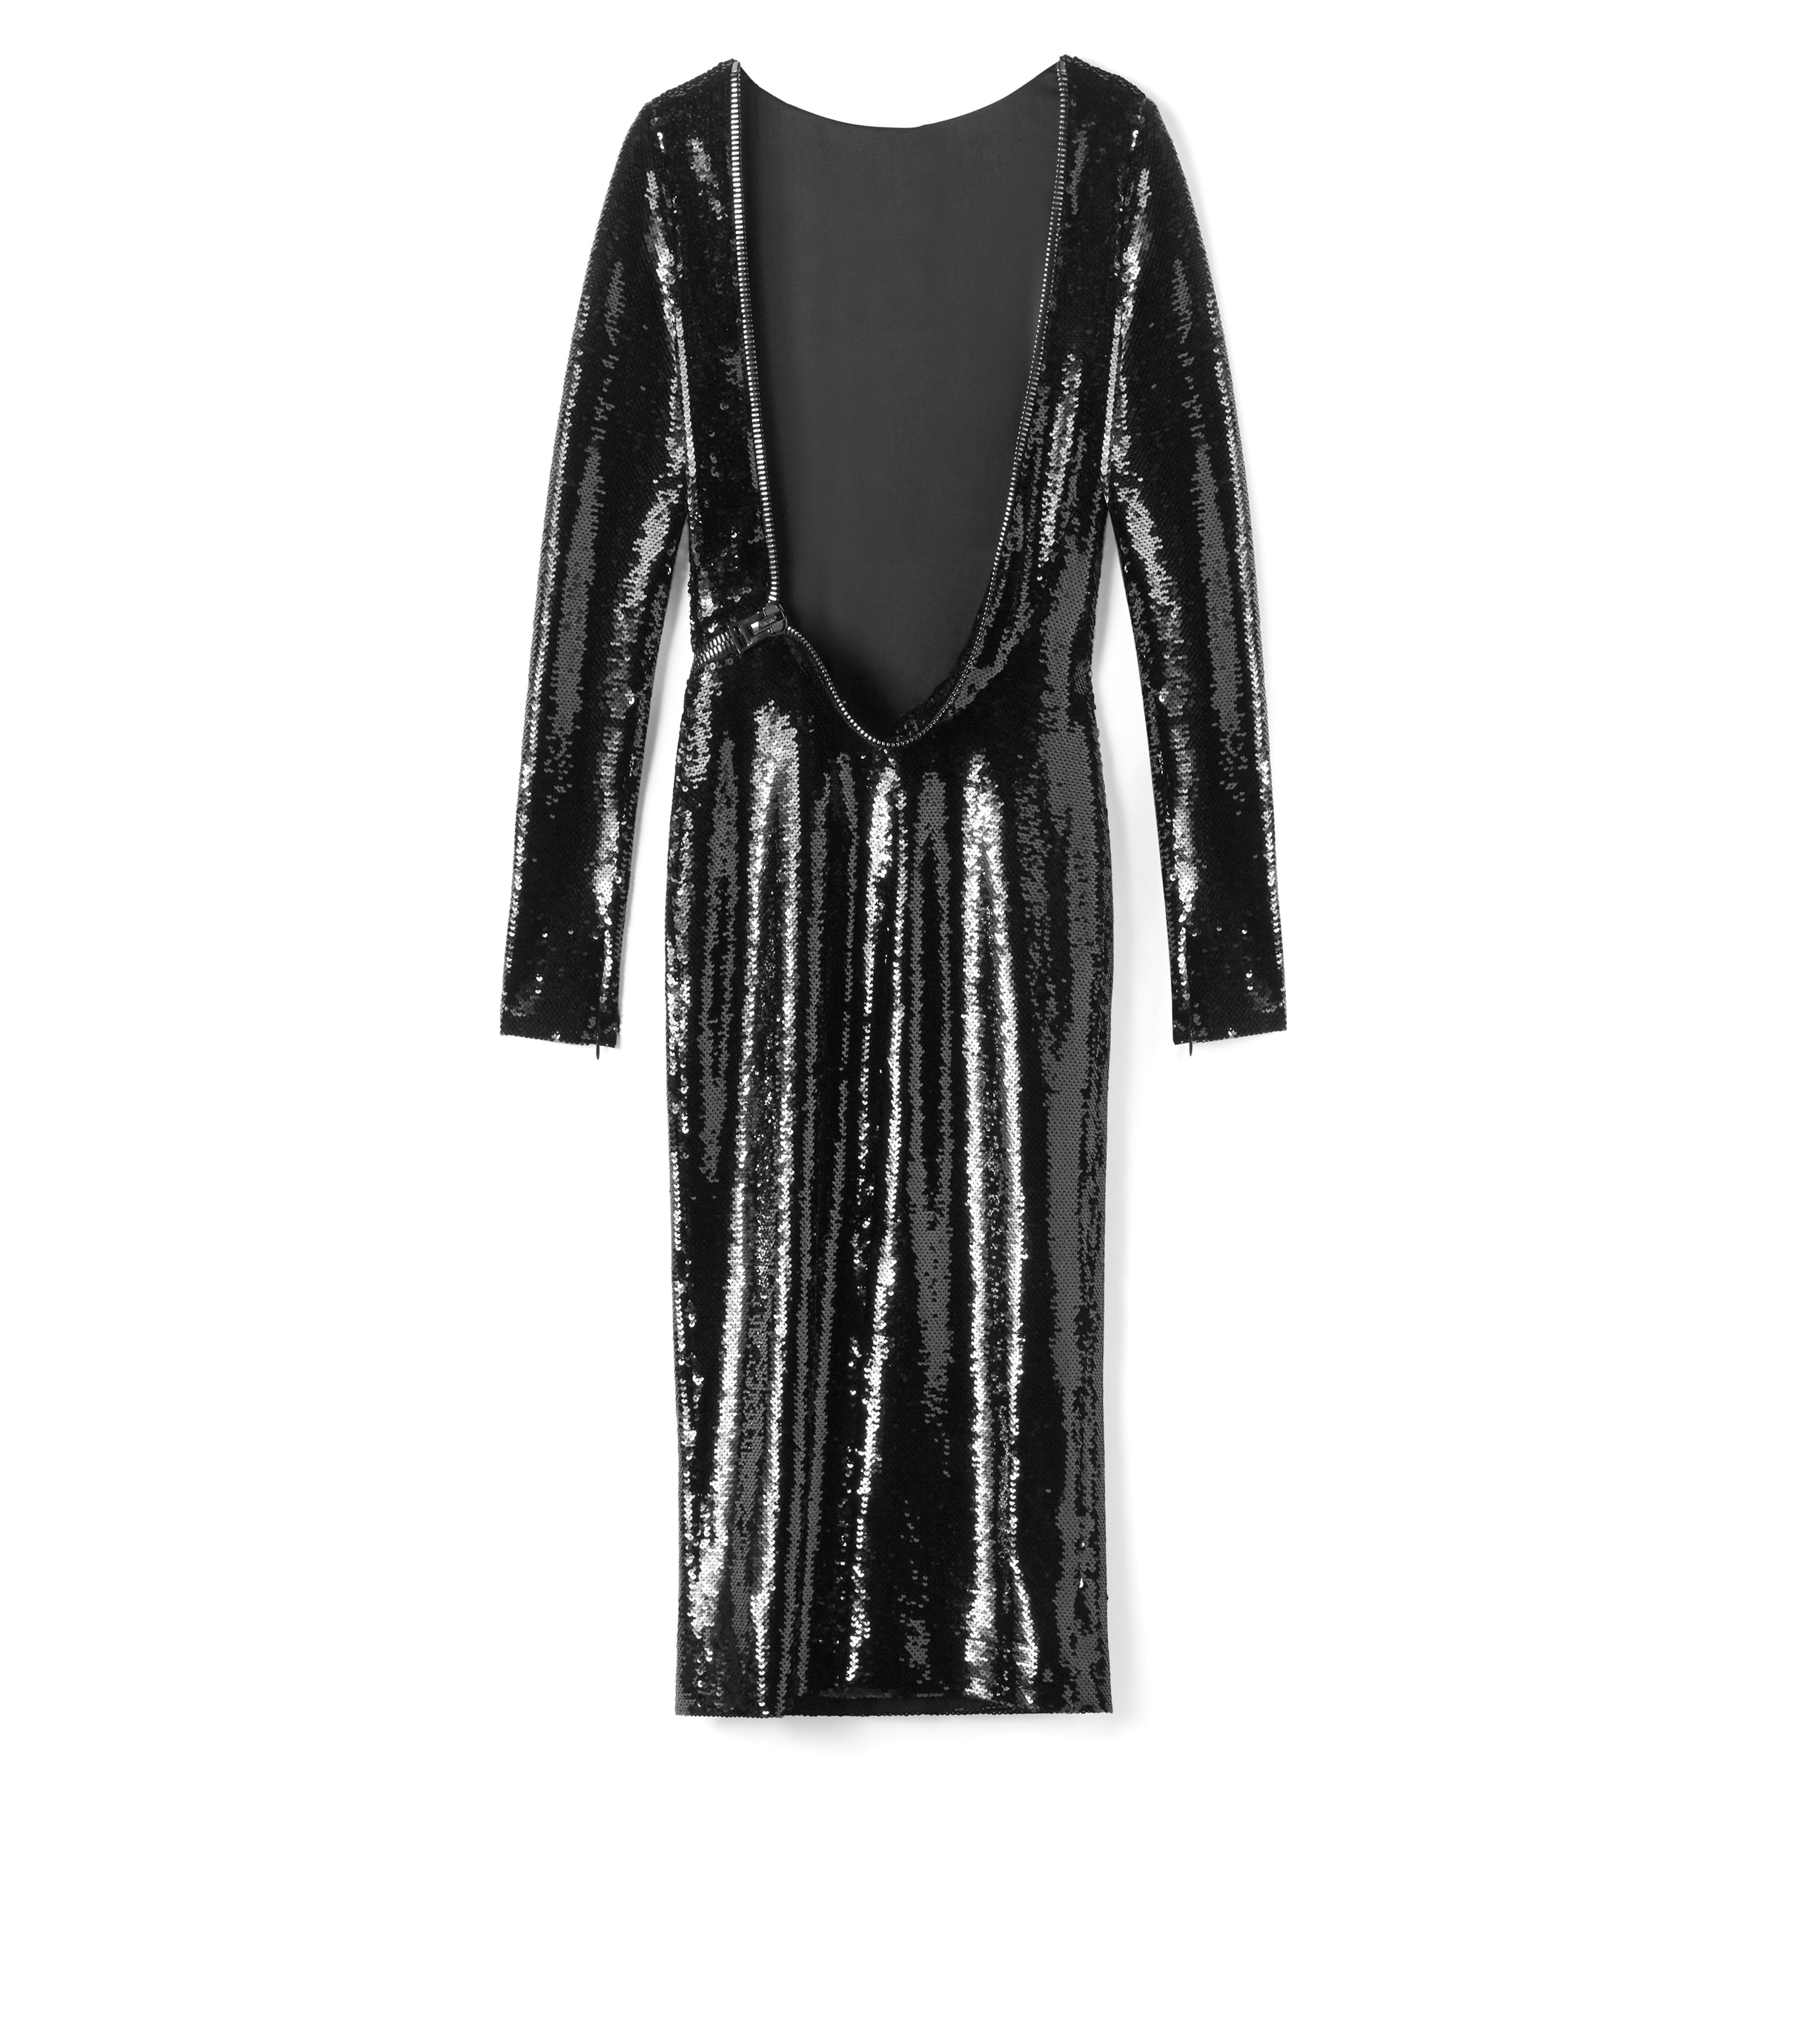 OPEN BACK ZIP LIQUID SEQUIN DRESS B thumbnail